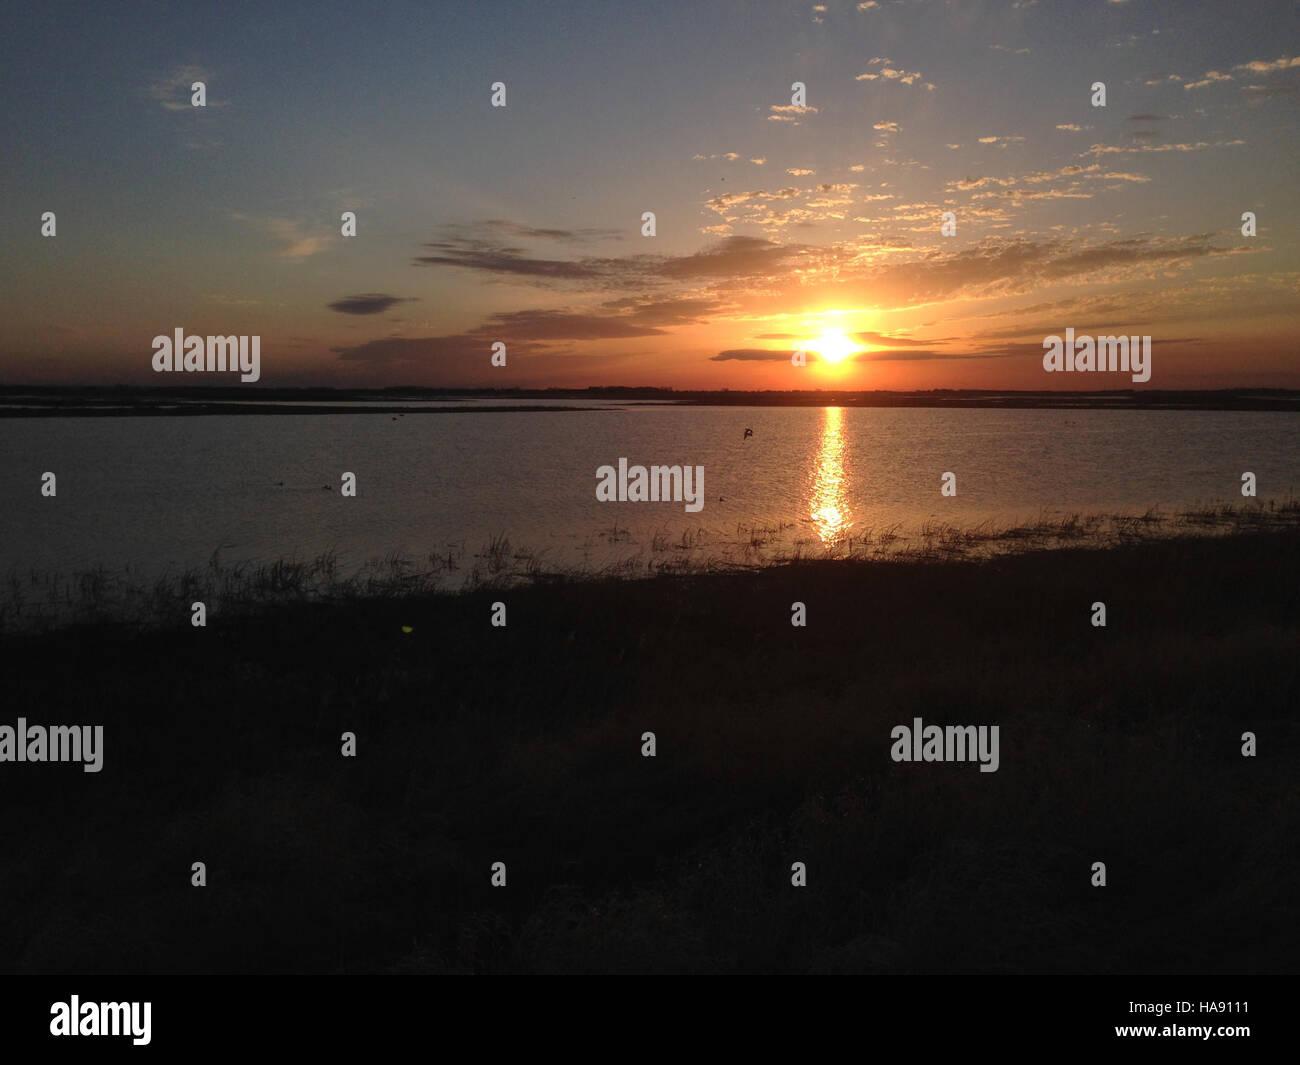 usfwsmtnprairie 28919470920 Sunrise at J. Clark Salyer NWR - Stock Image